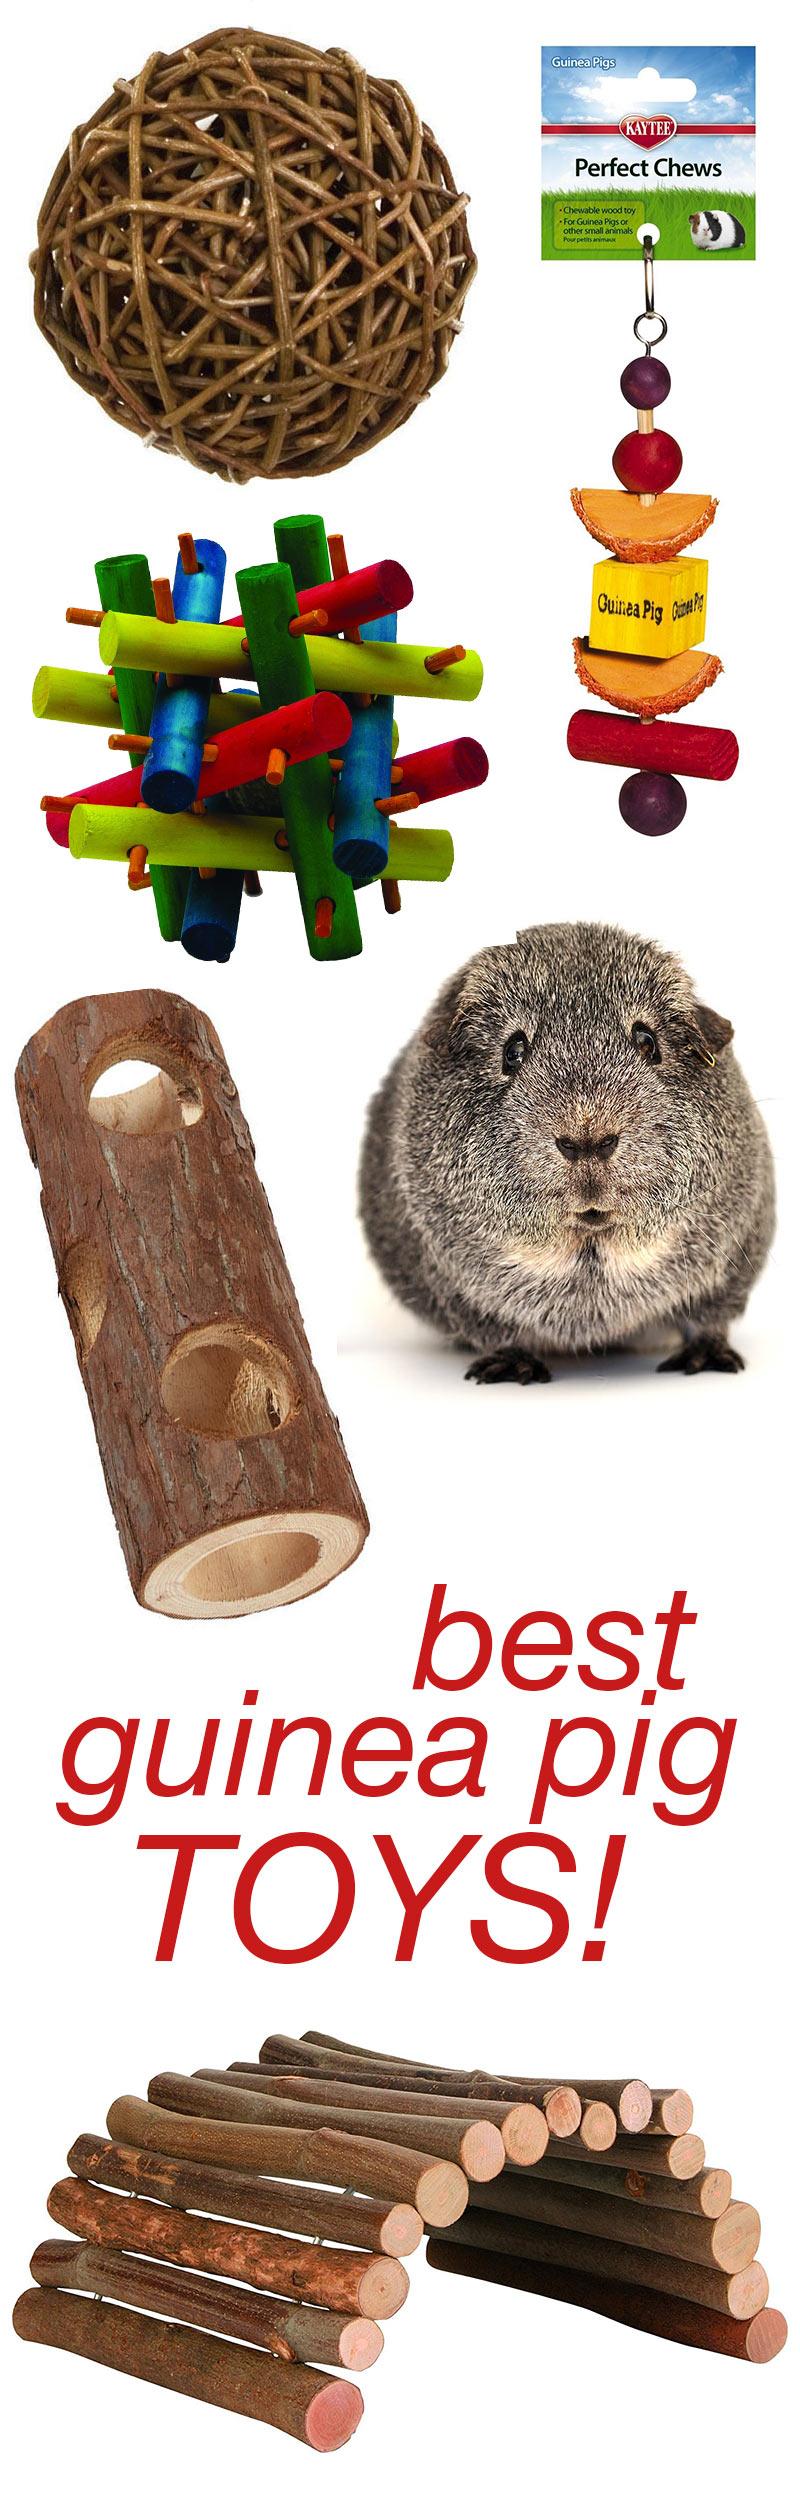 Best Guinea Pig Toys